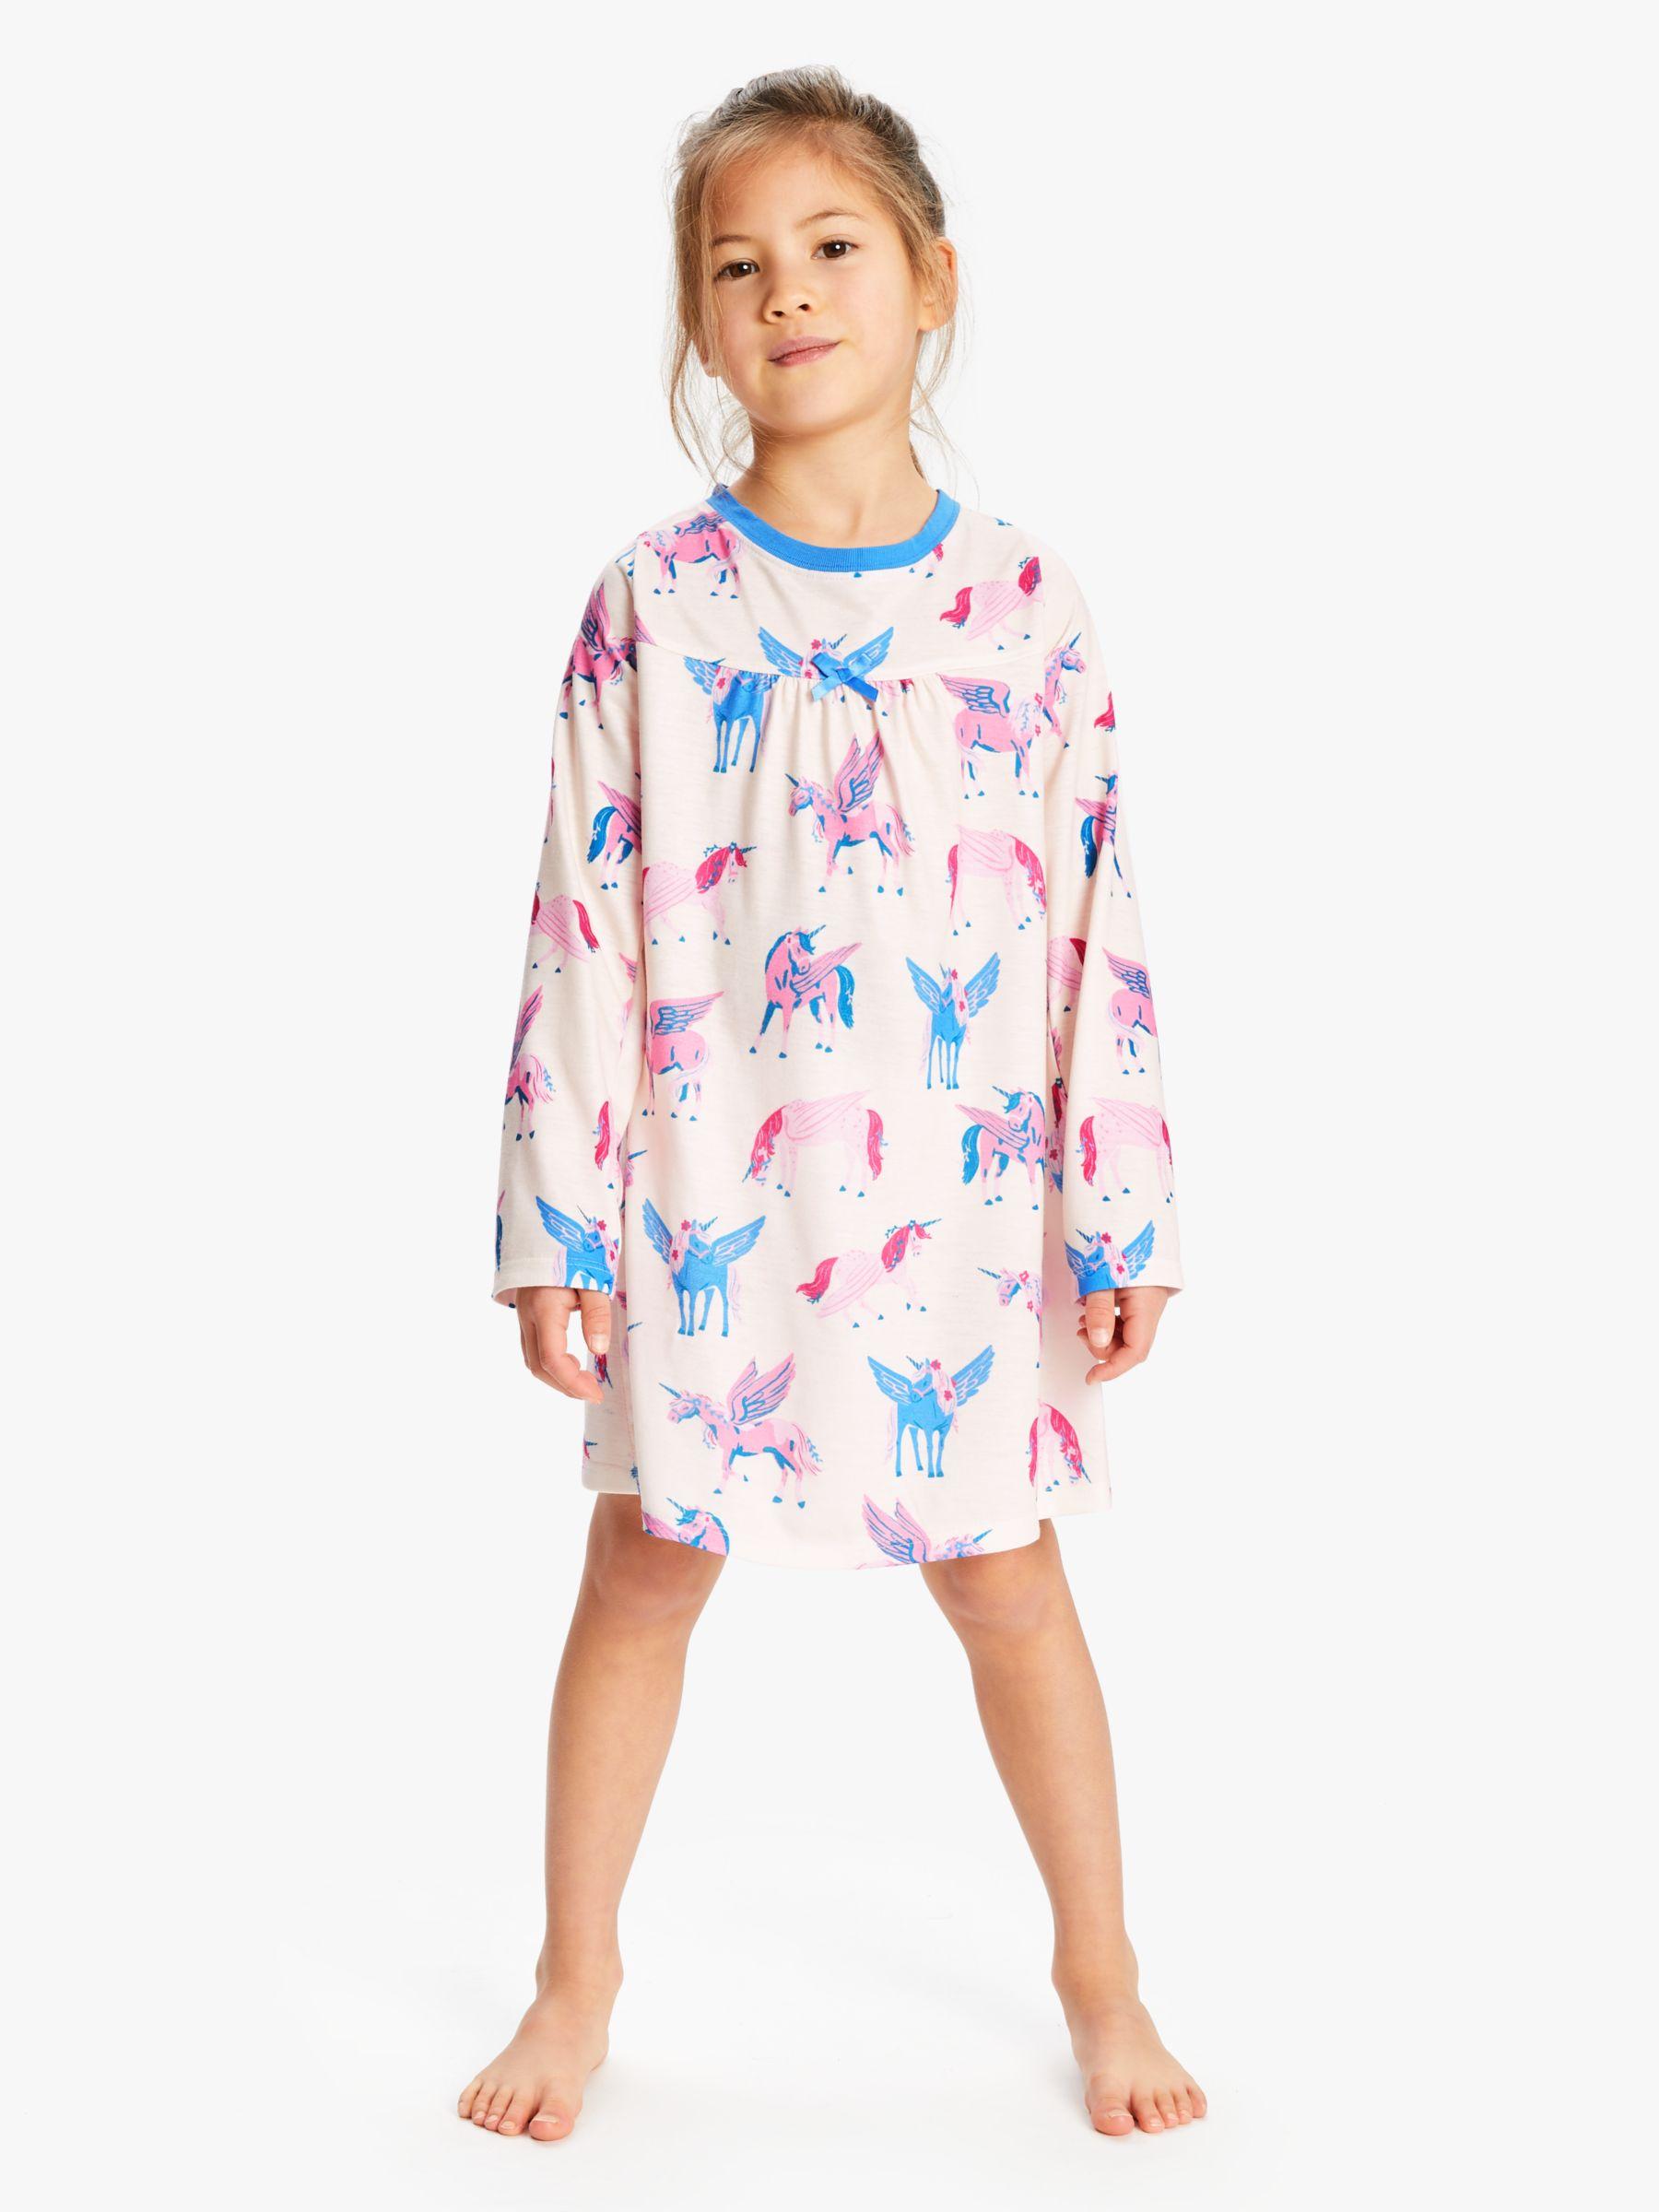 Hatley Hatley Girls' Unicorn Print Night Dress, Multi